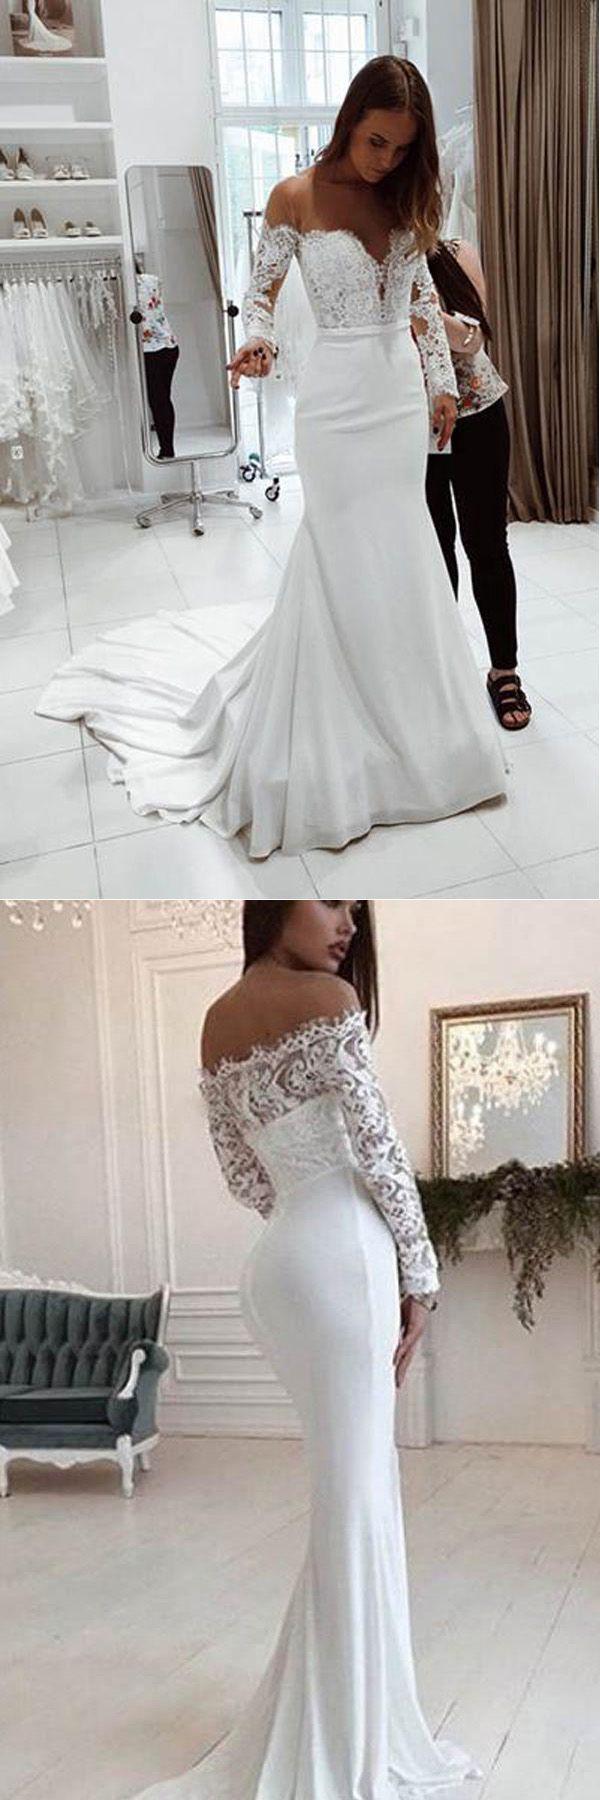 Mermaid off the shoulder long sleeves sweep train wedding dress with